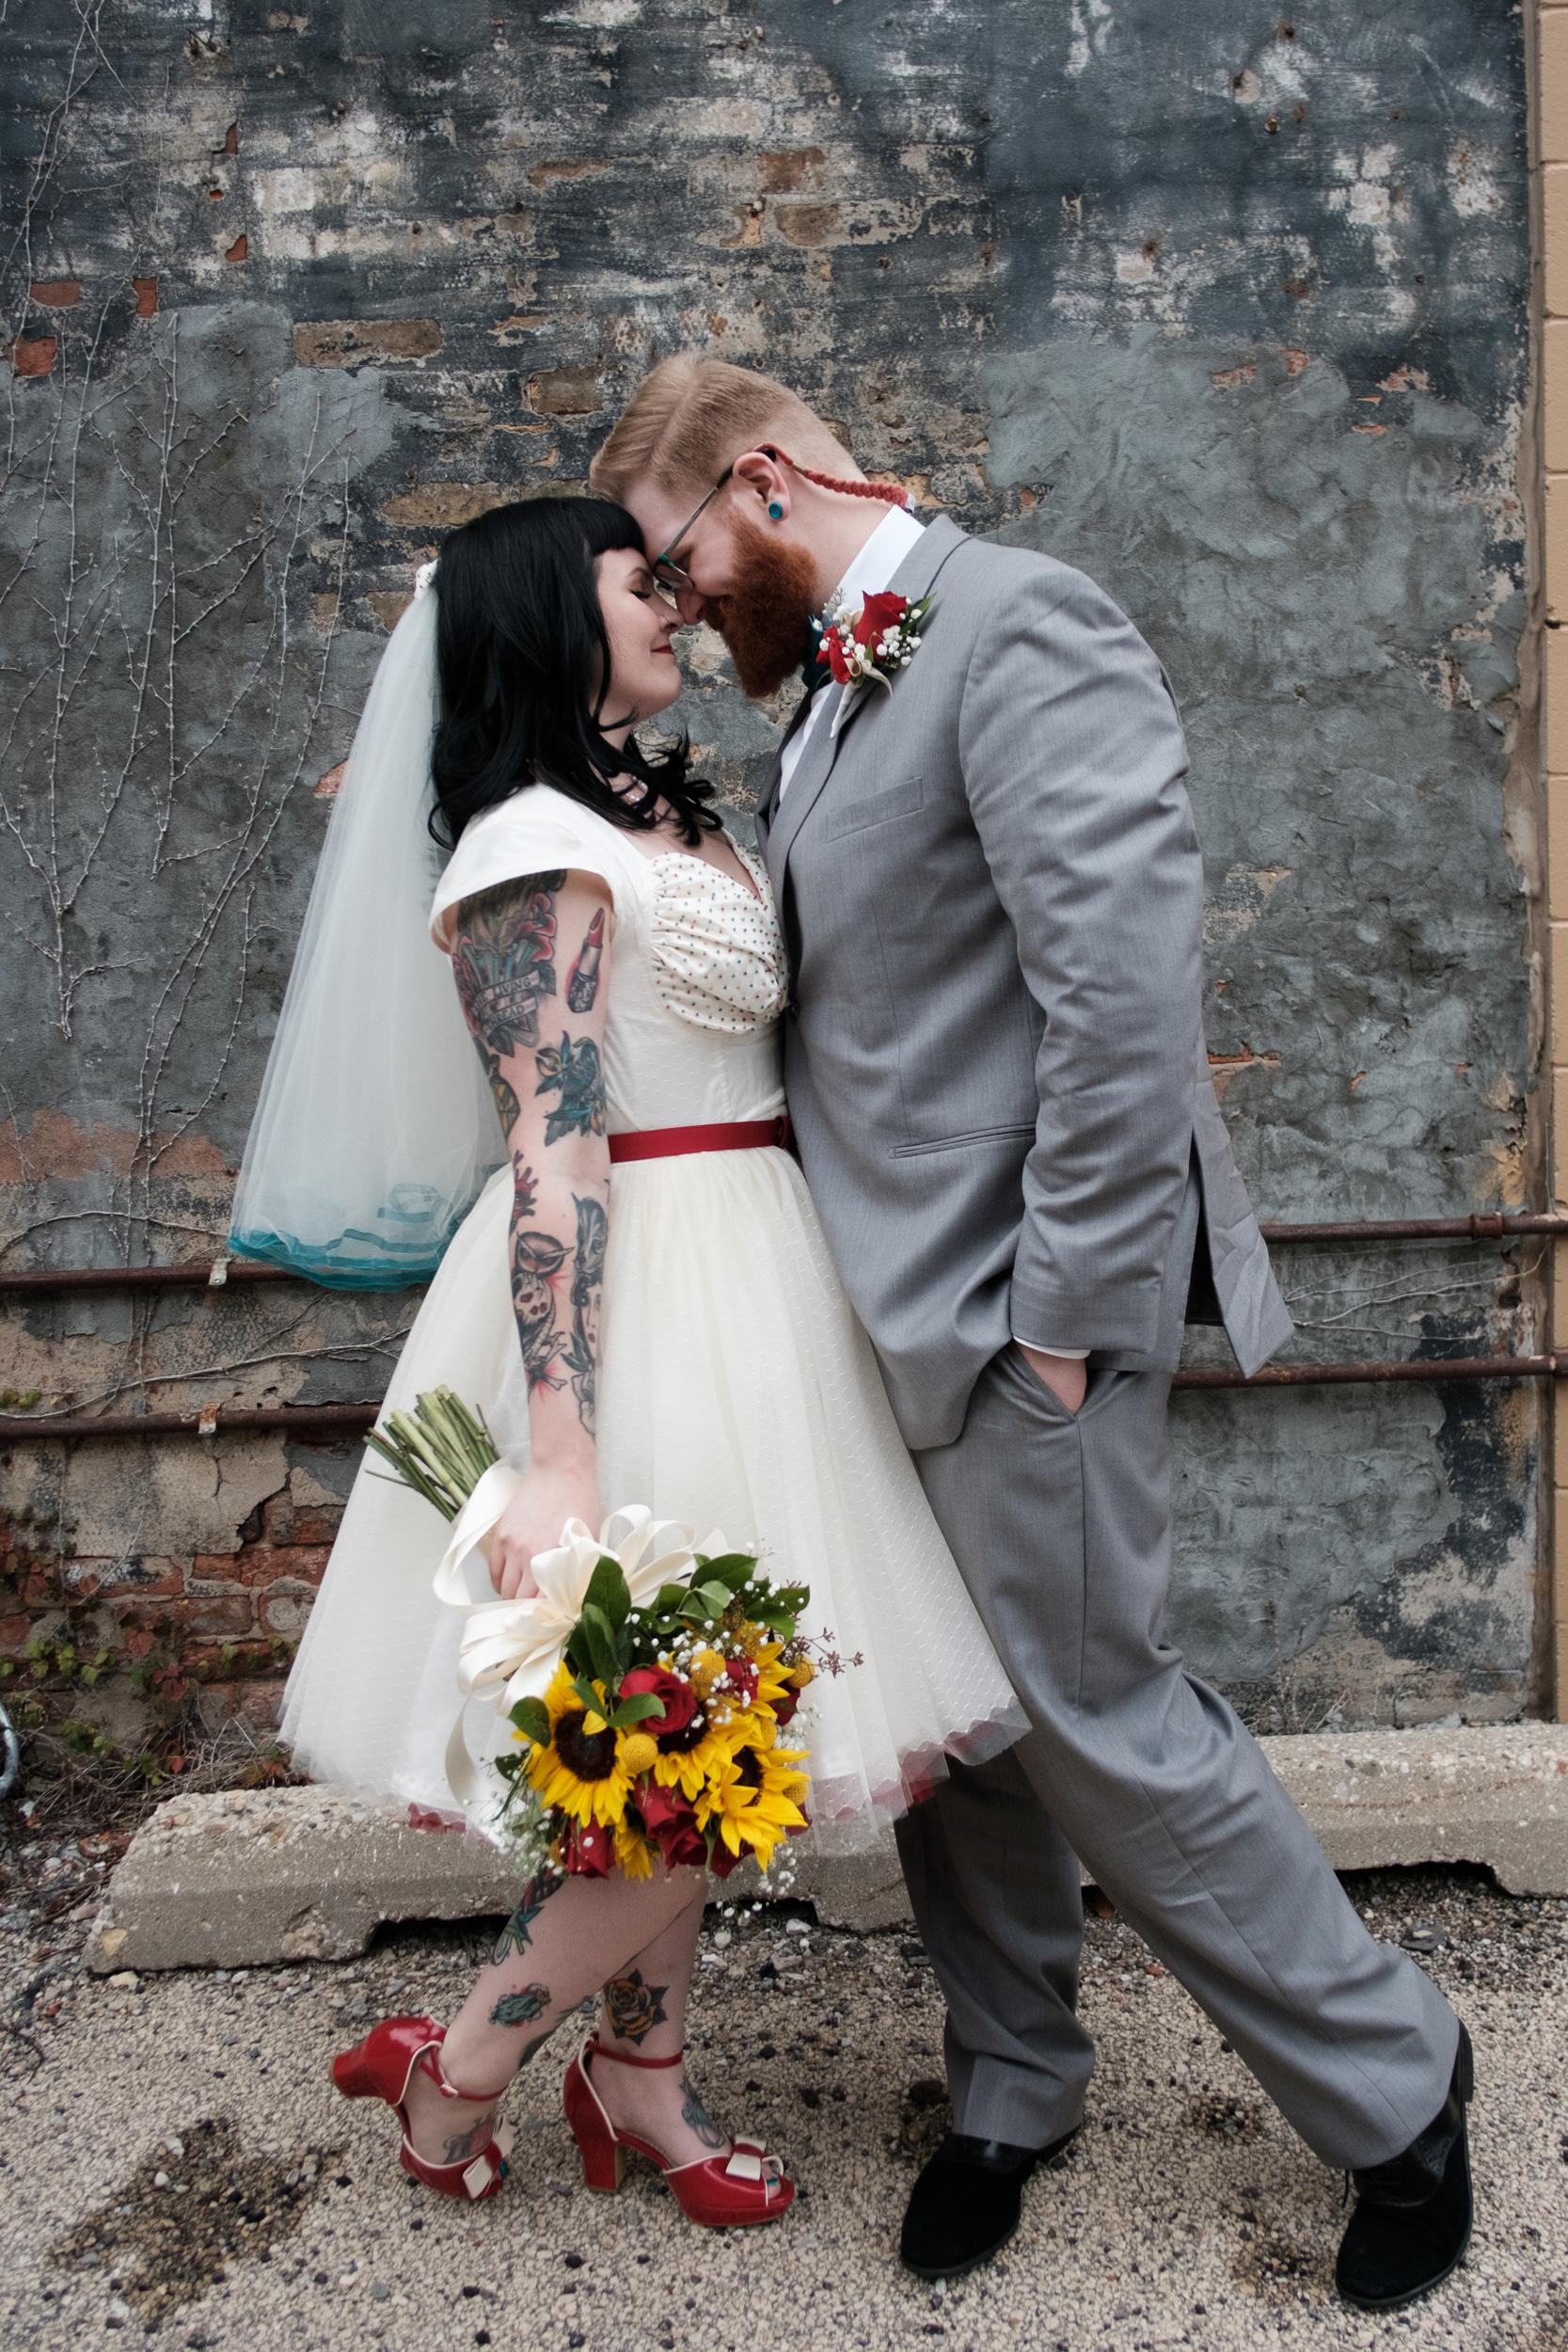 Christian & Sarah wedding photography by Brian milo-188.jpg